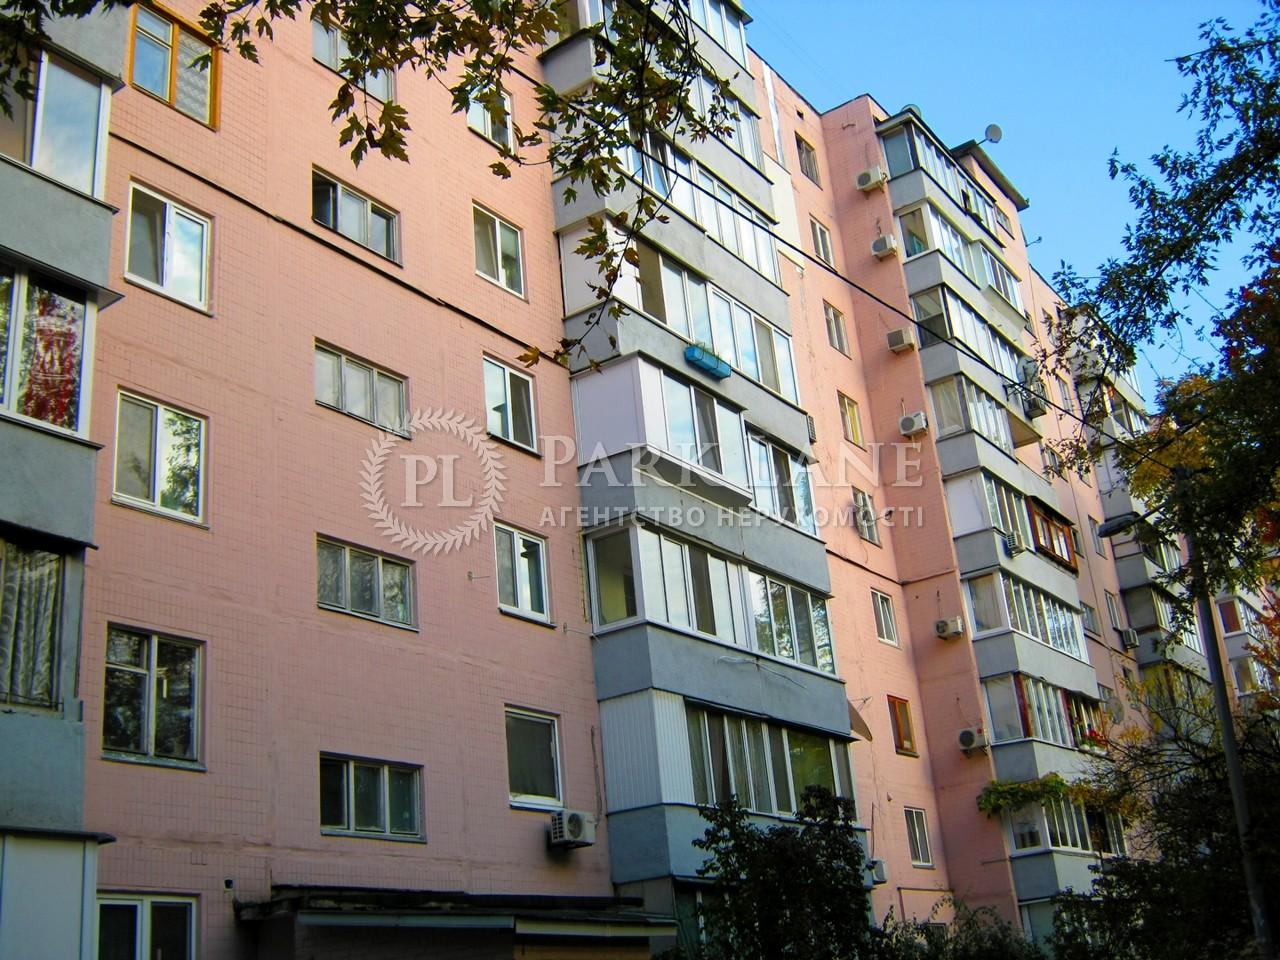 Квартира Новогоспитальная (Щорса пер.), 5а, Киев, M-1170 - Фото 1